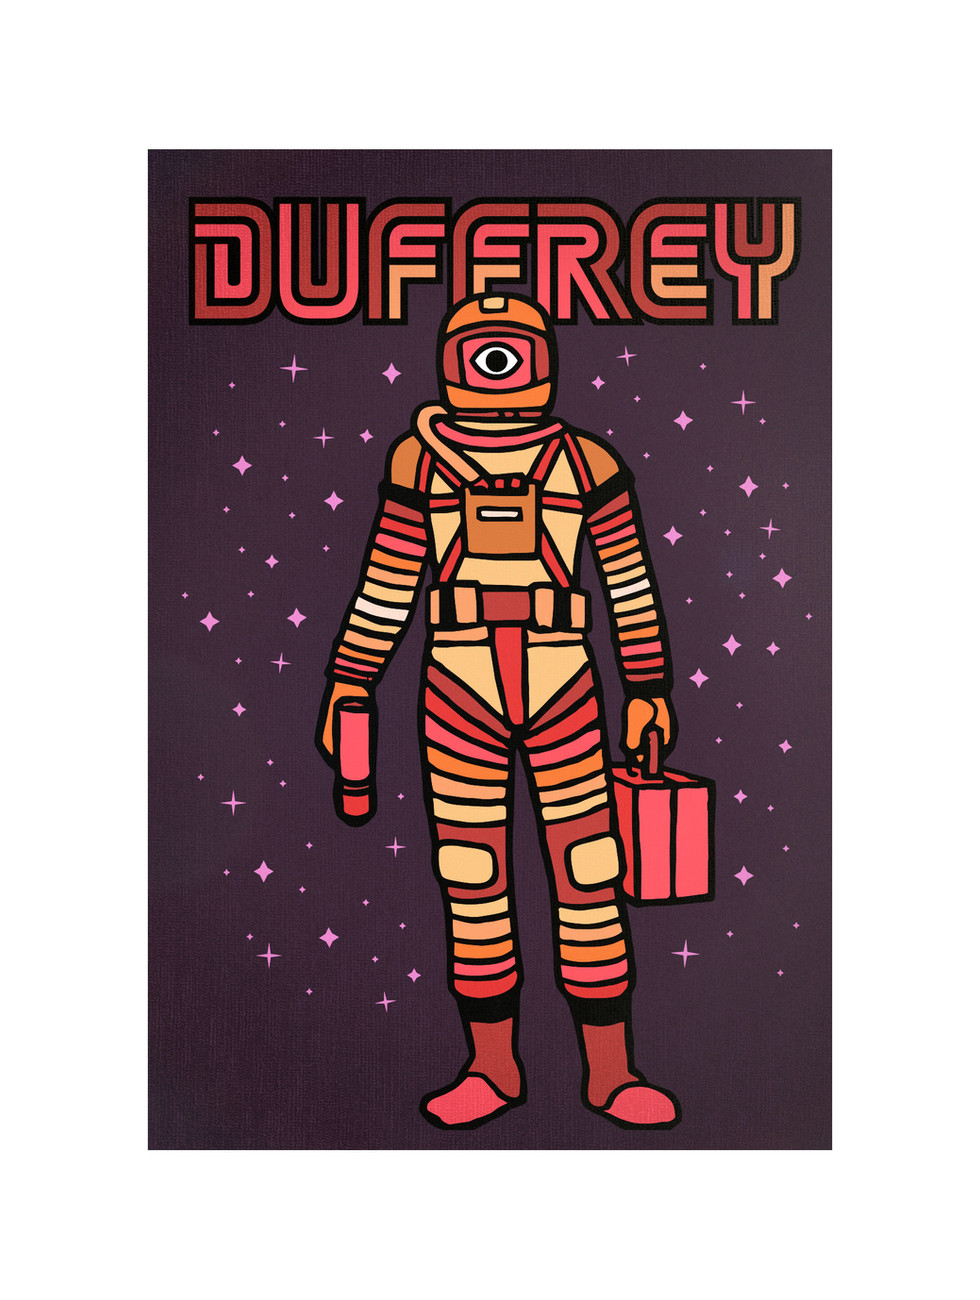 duffreyspacemanweb.jpg